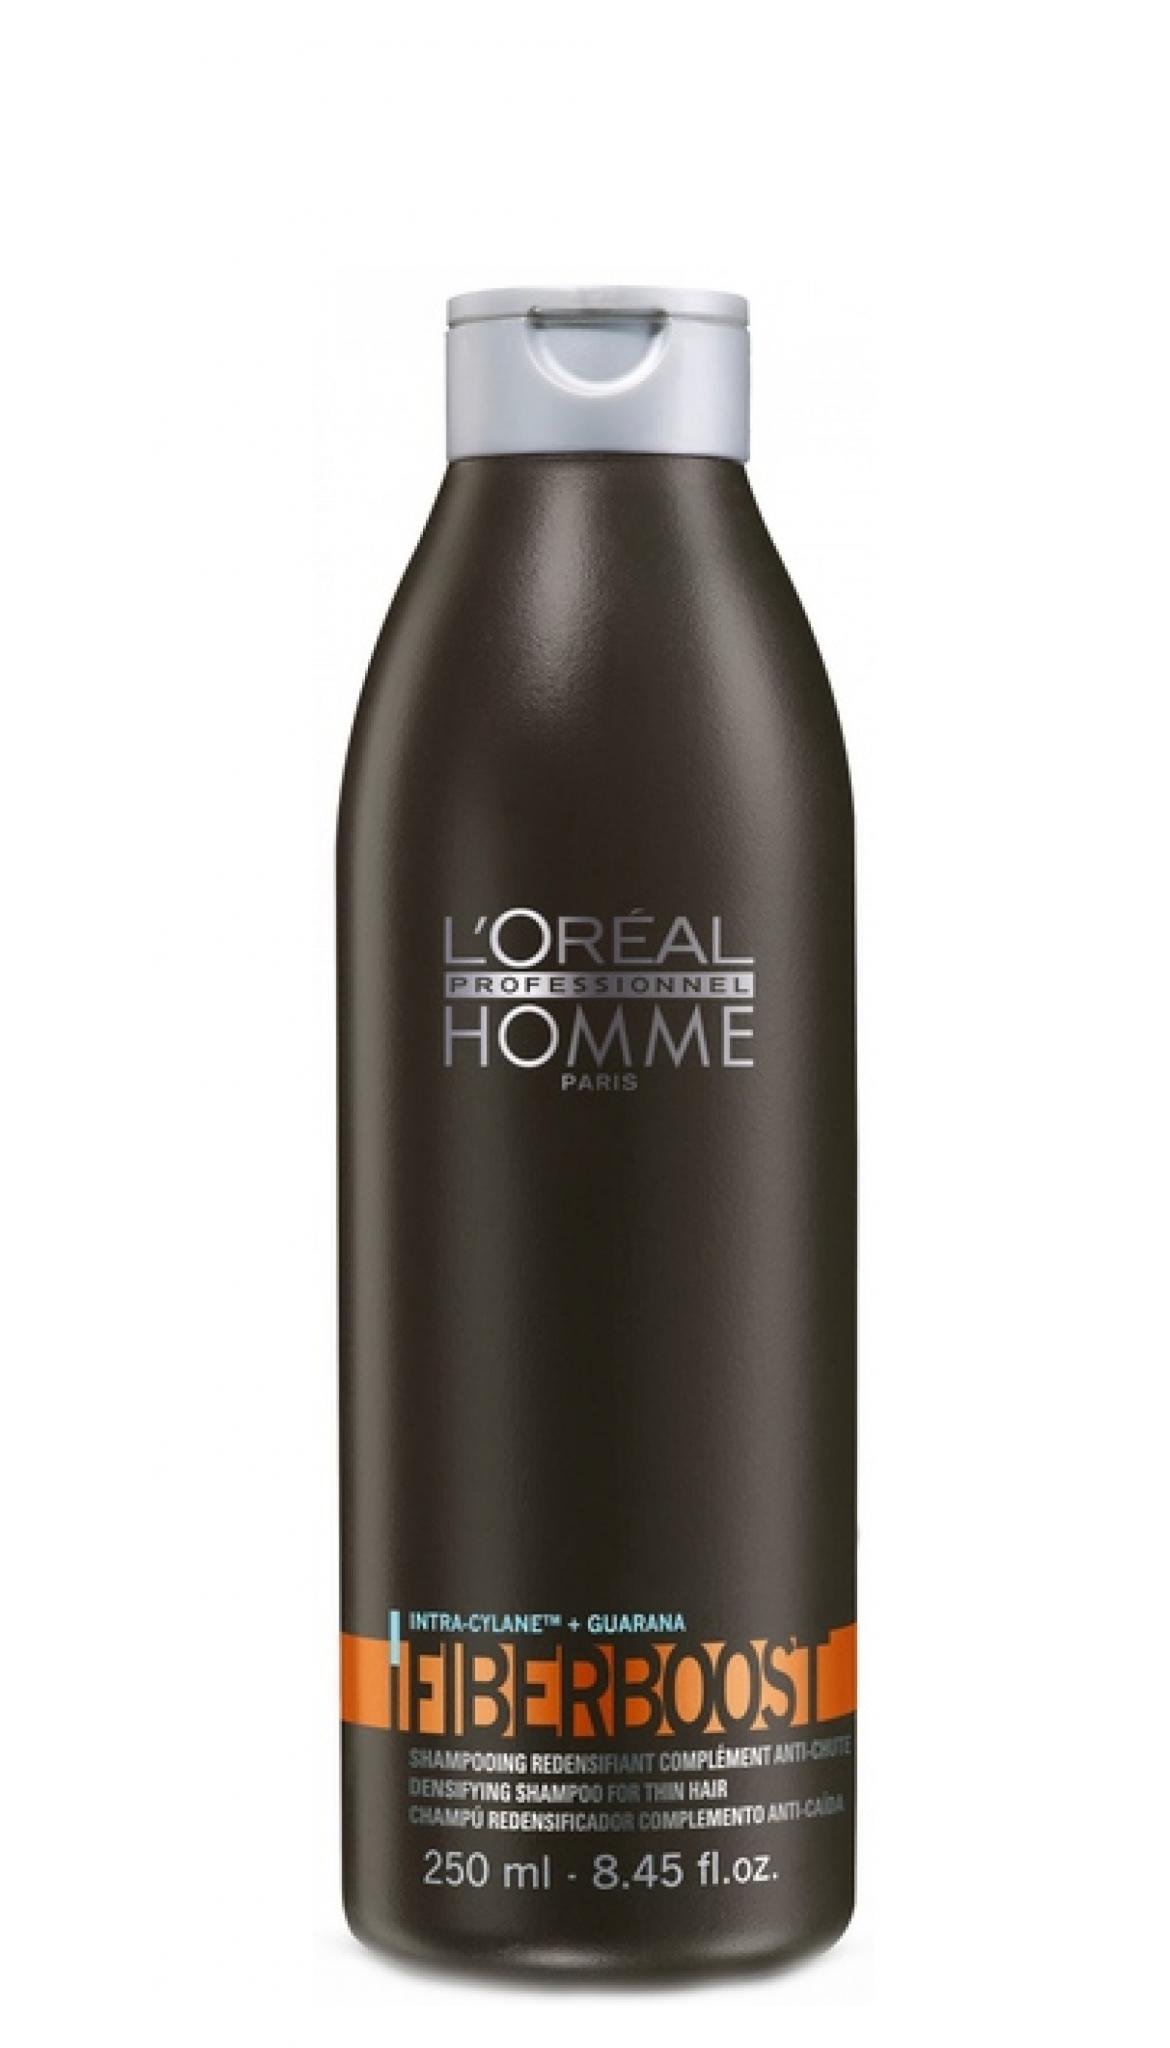 Šampūnas ploniems plaukams L'Oreal Professionnel Homme Fiberboost Shampoo 250ml-0